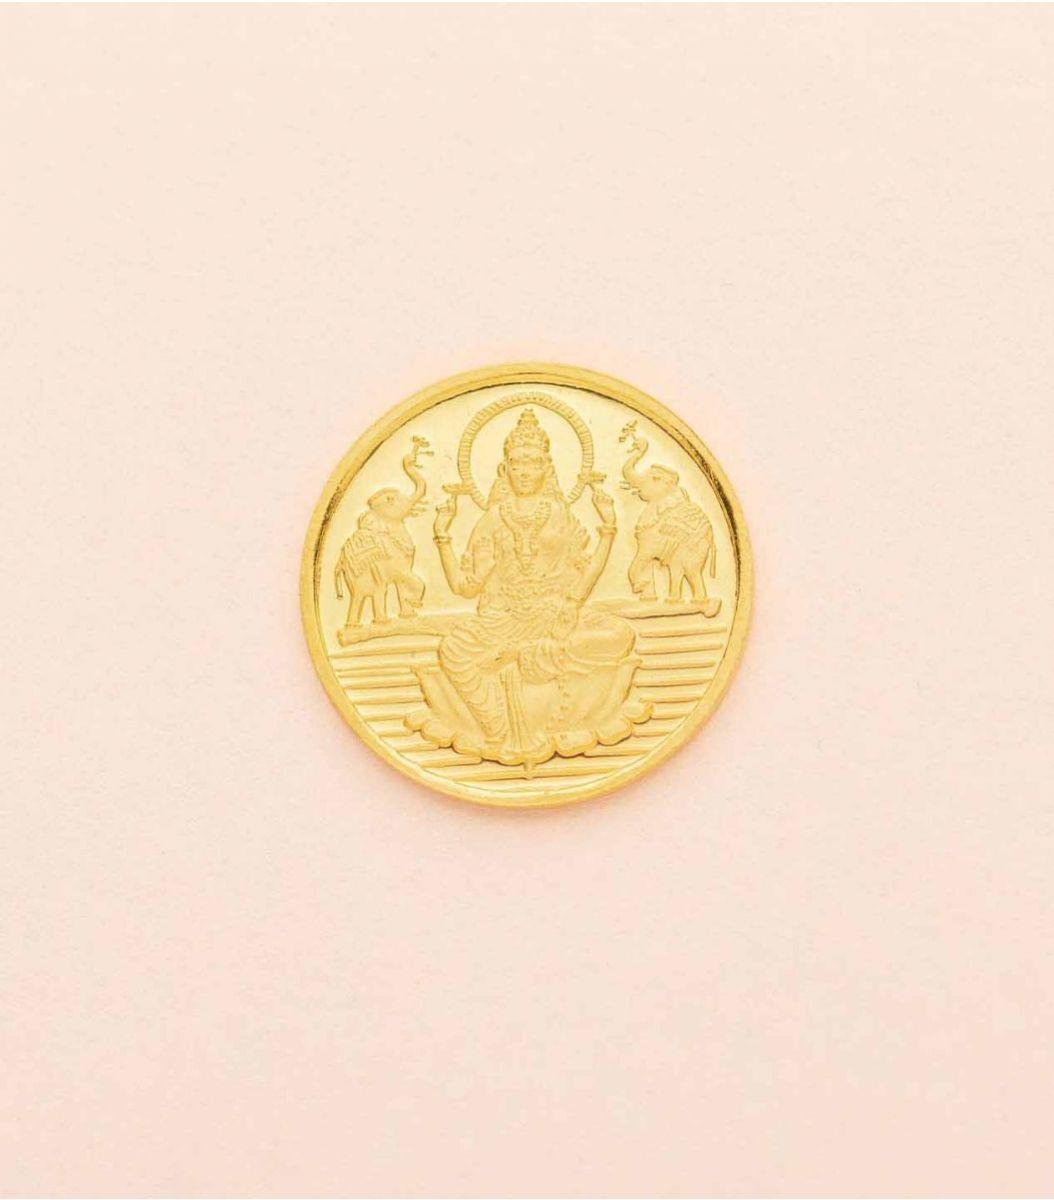 Gold Laxmi Coin-1GM